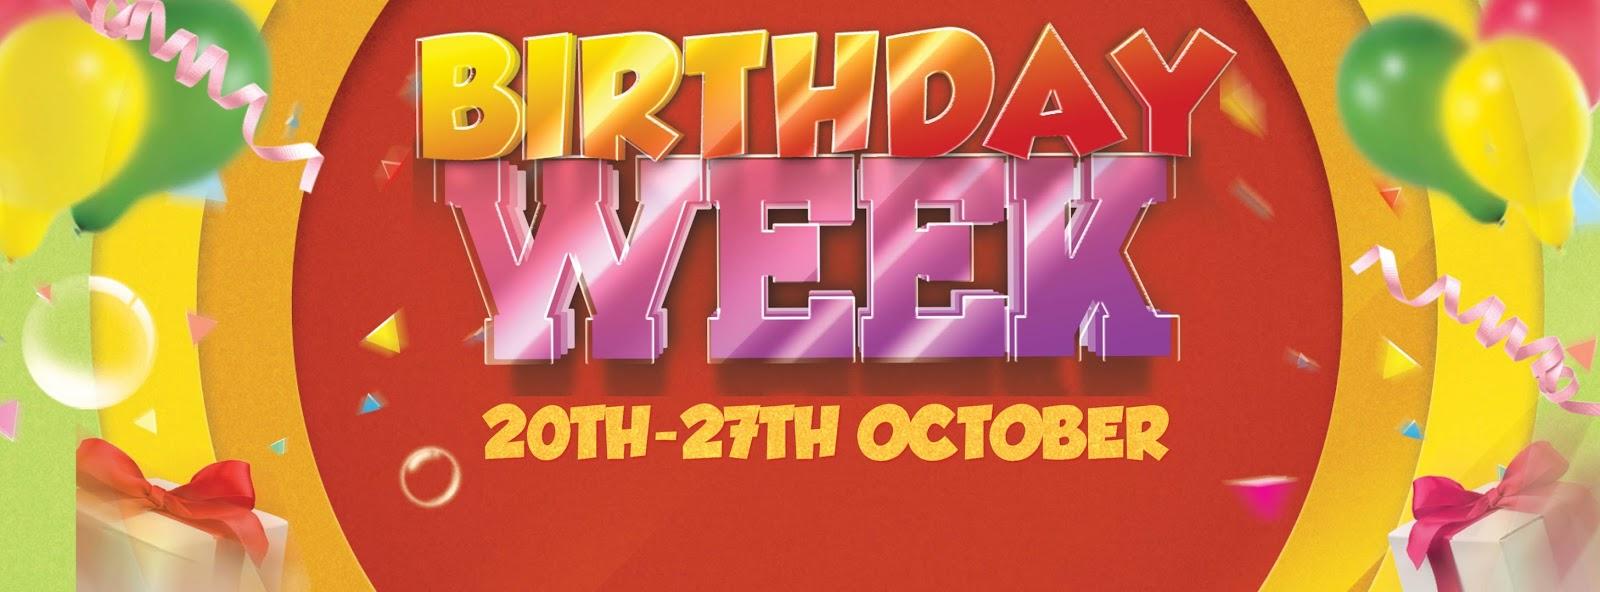 http://www.crafterscompanion.com/Birthday-Week-Specials_c_160.html?AffId=67